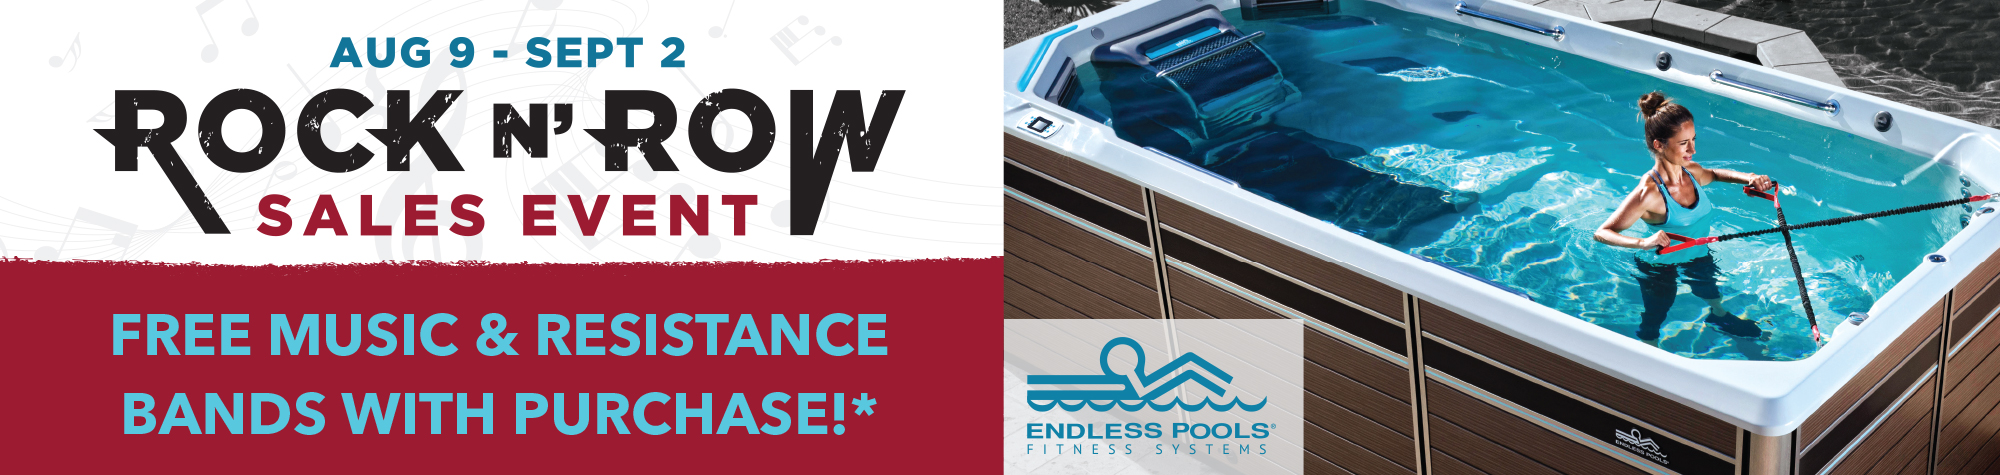 Endless Pools Rebate or Ride Event